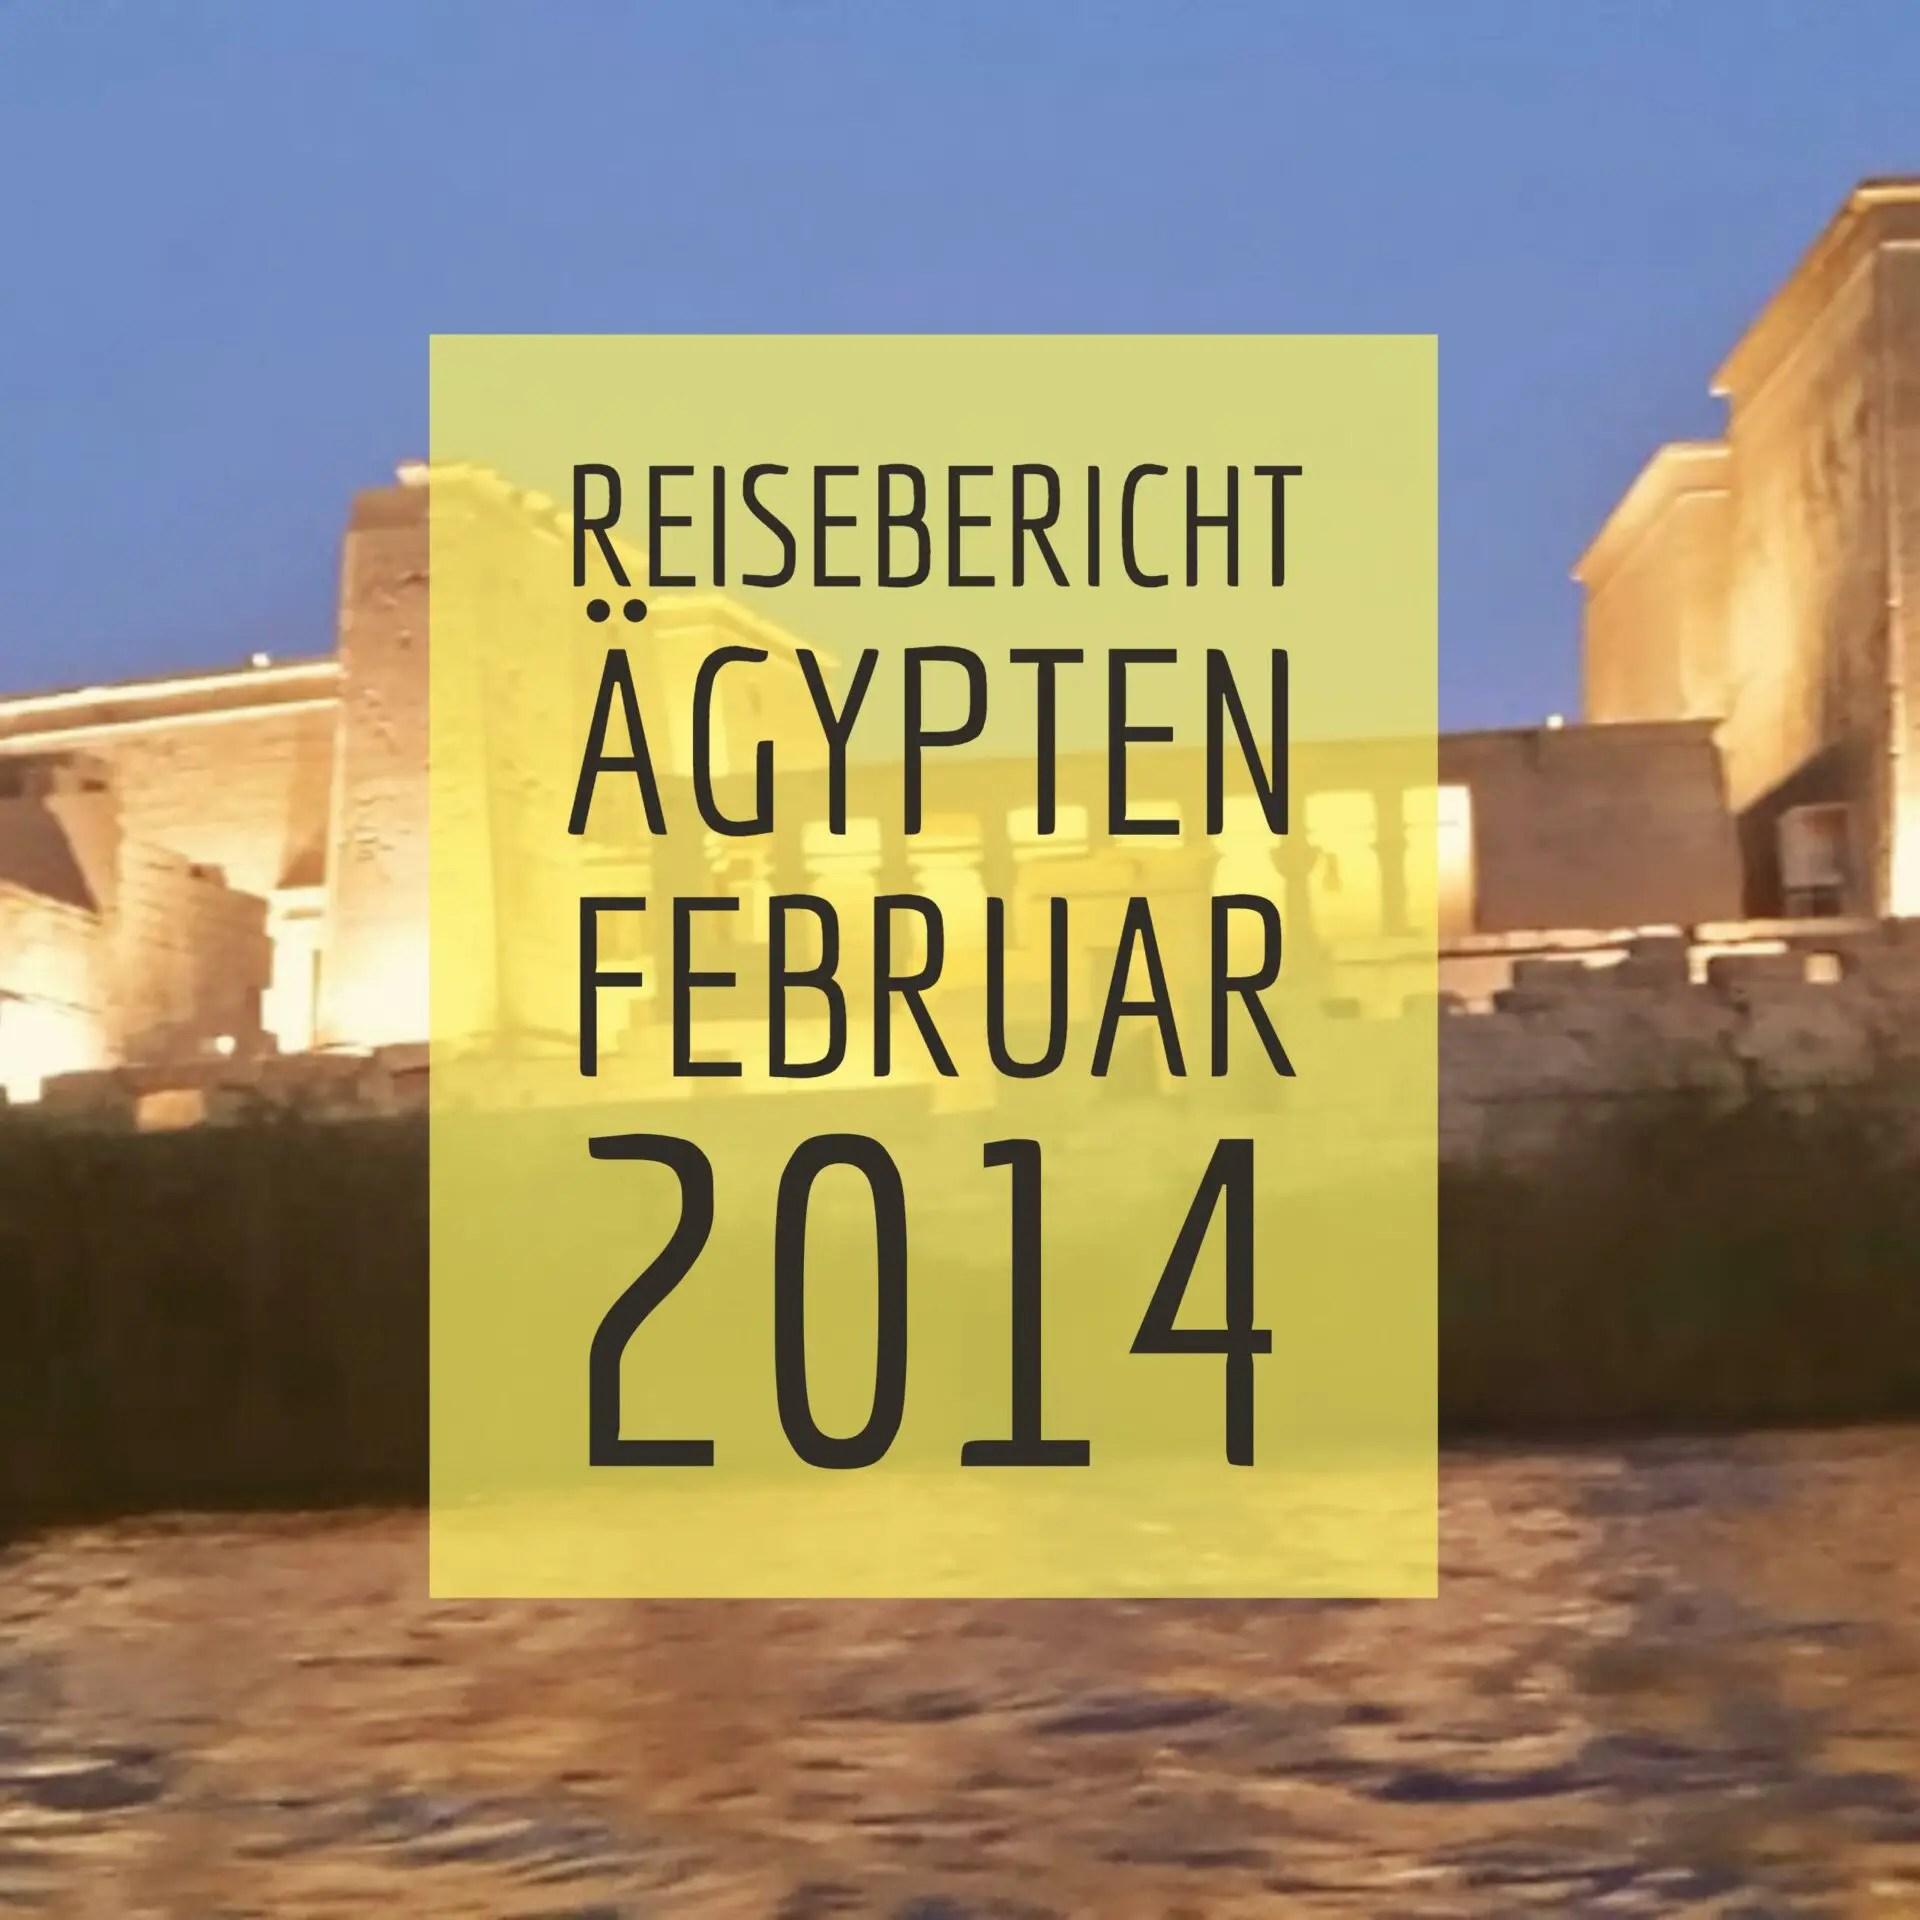 Reisebericht Ägypten Februar 2014